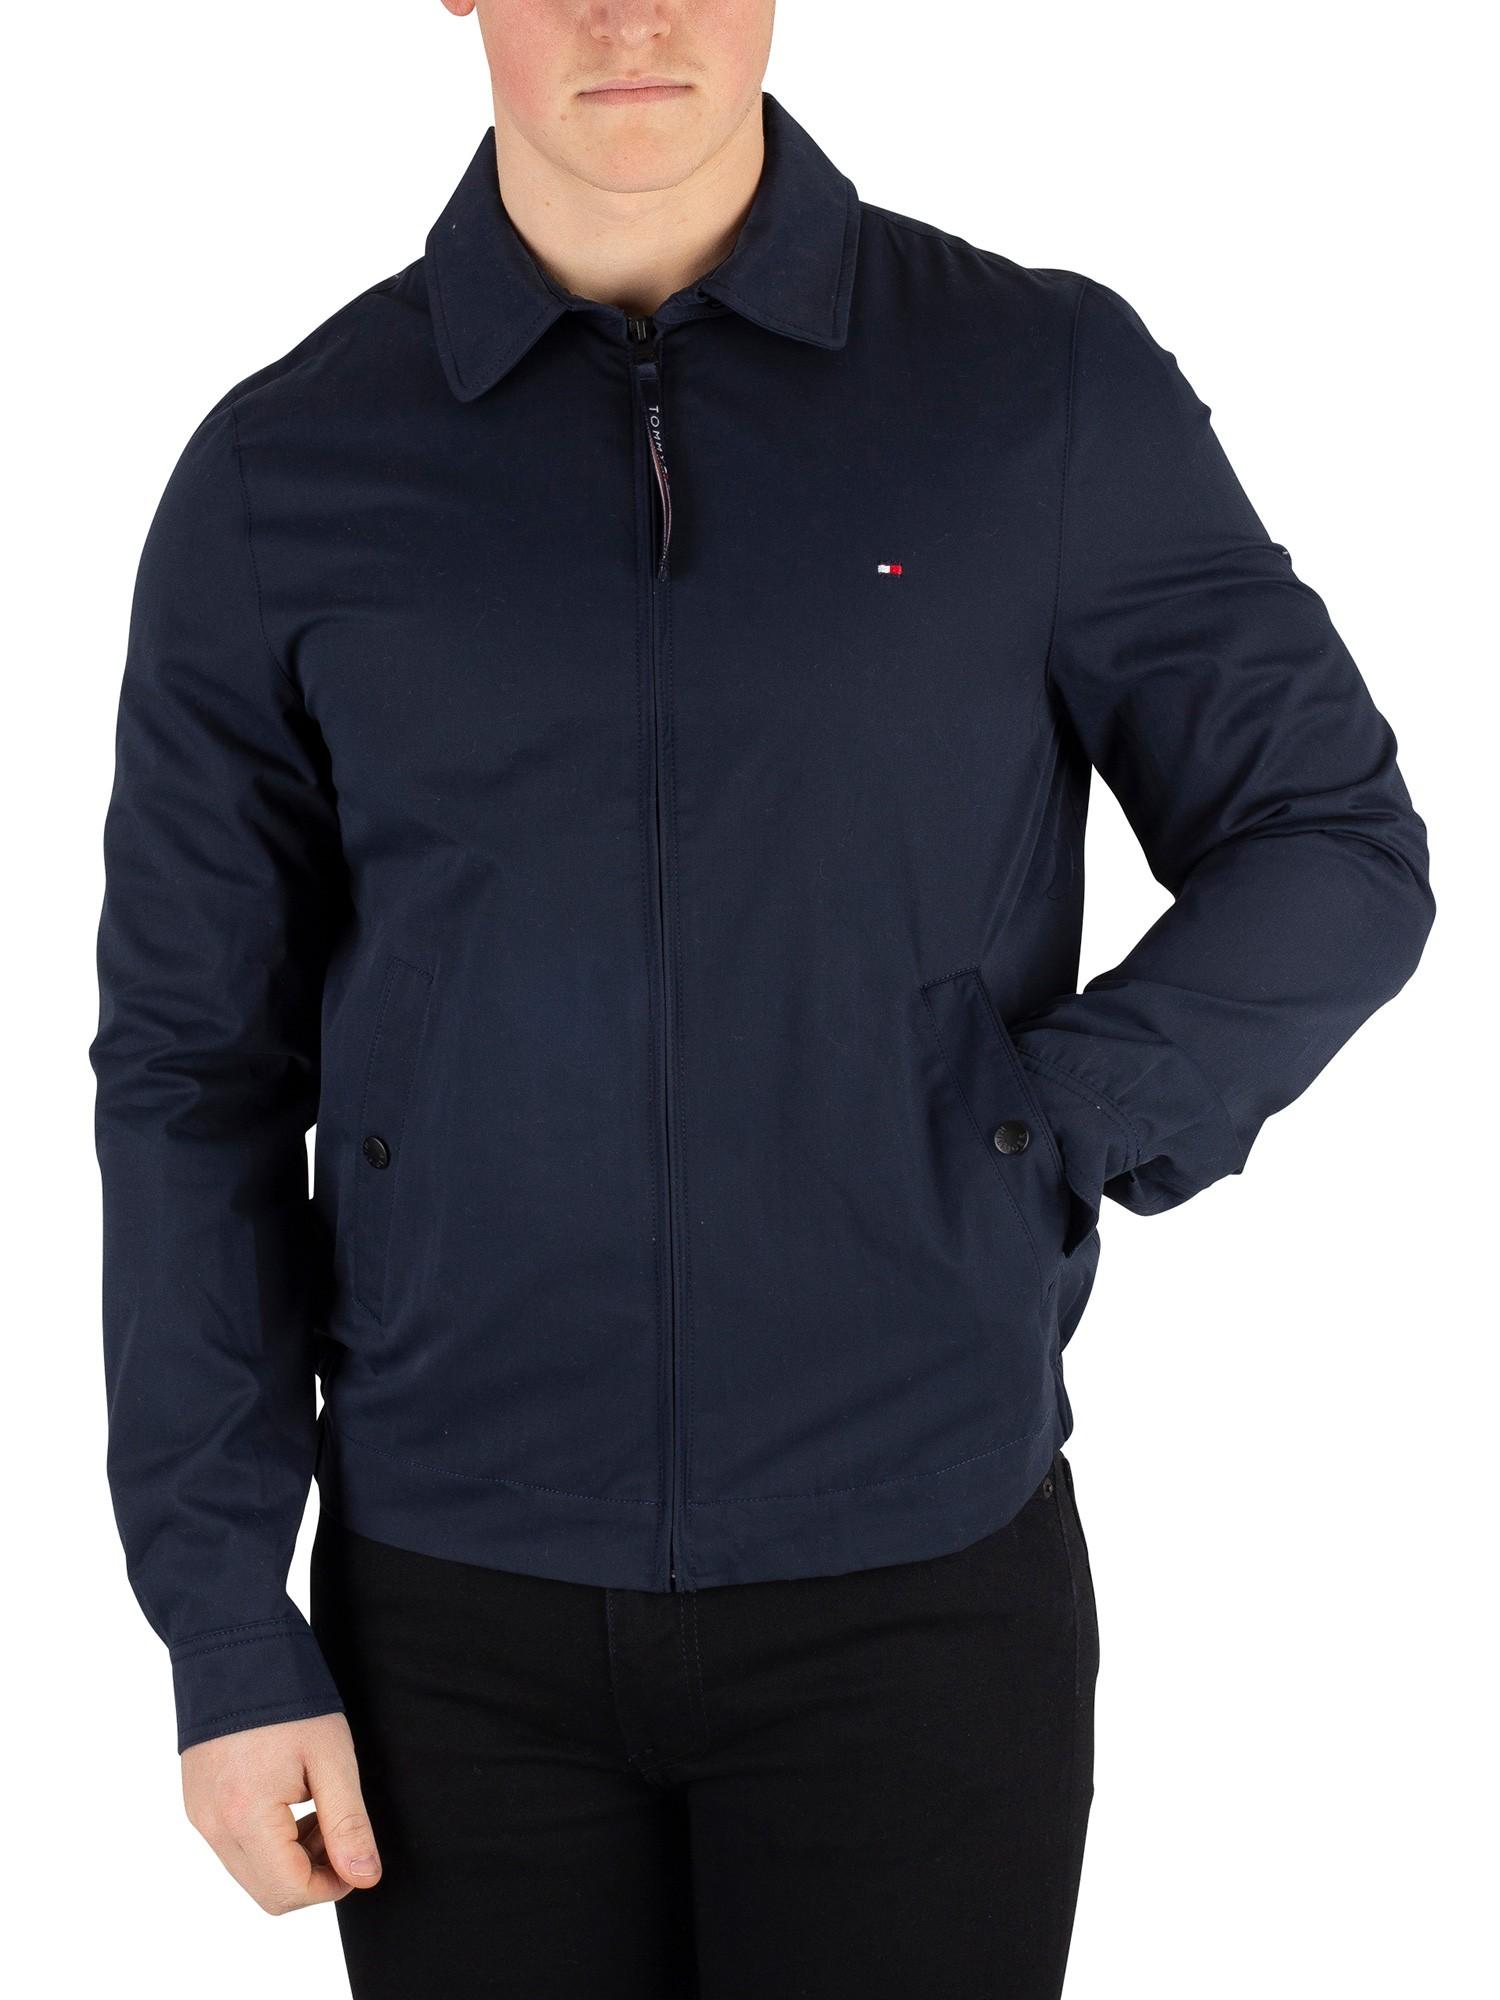 492d8f86a Tommy Hilfiger | Tommy Hilfiger Men's Jackets & Coats | Standout